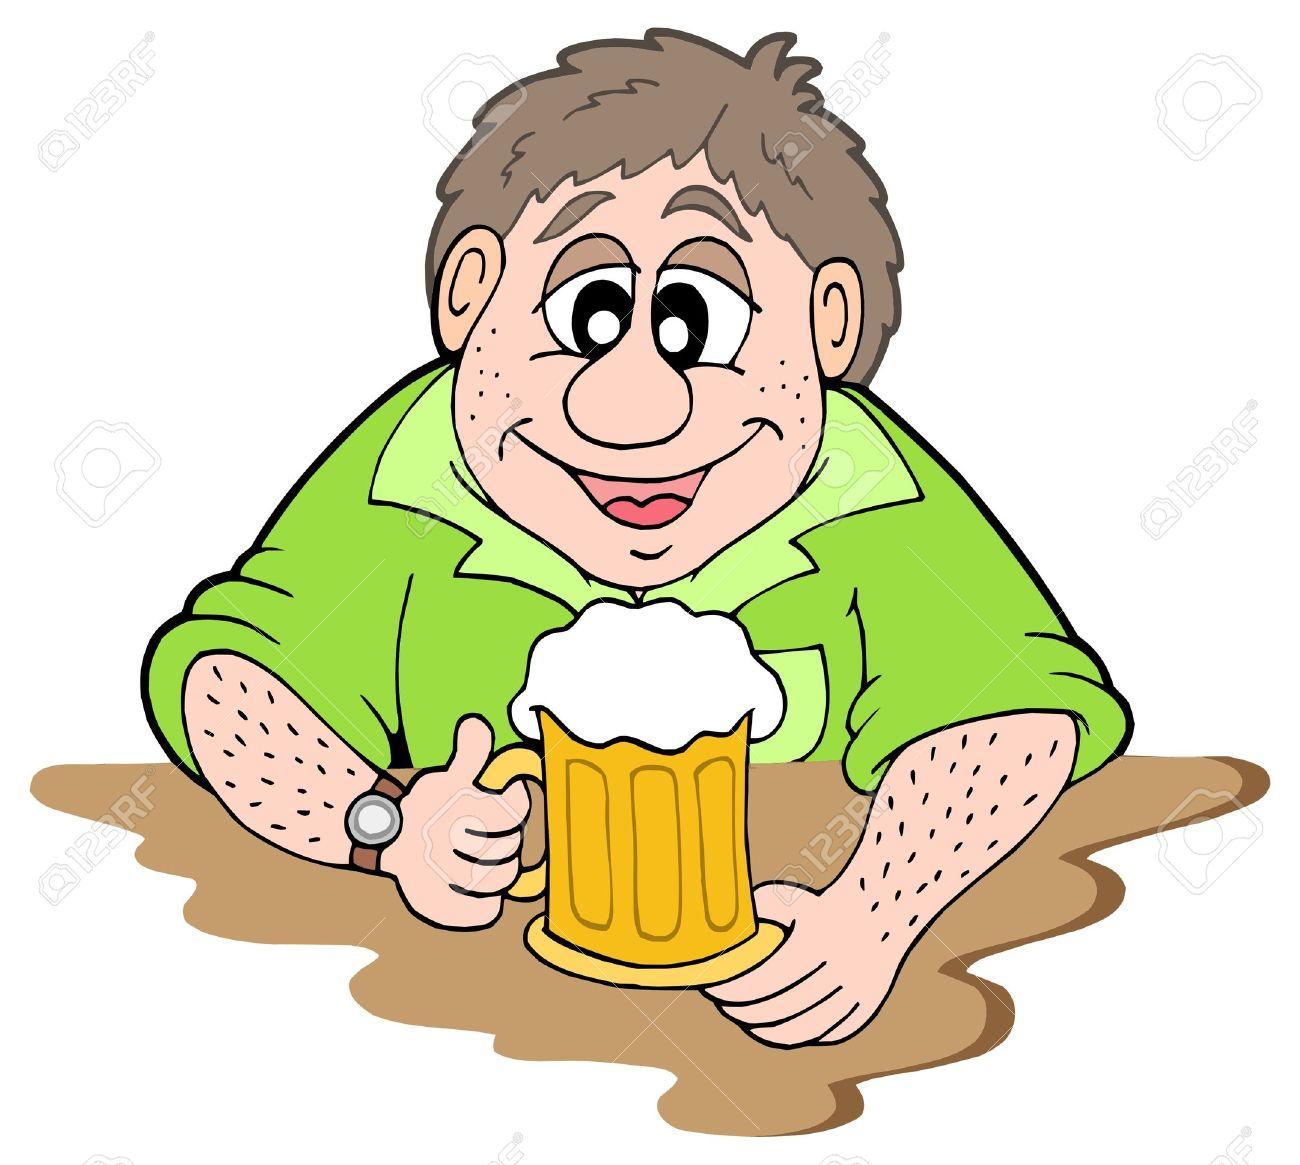 Alkohol trinken clipart 8 » Clipart Station.